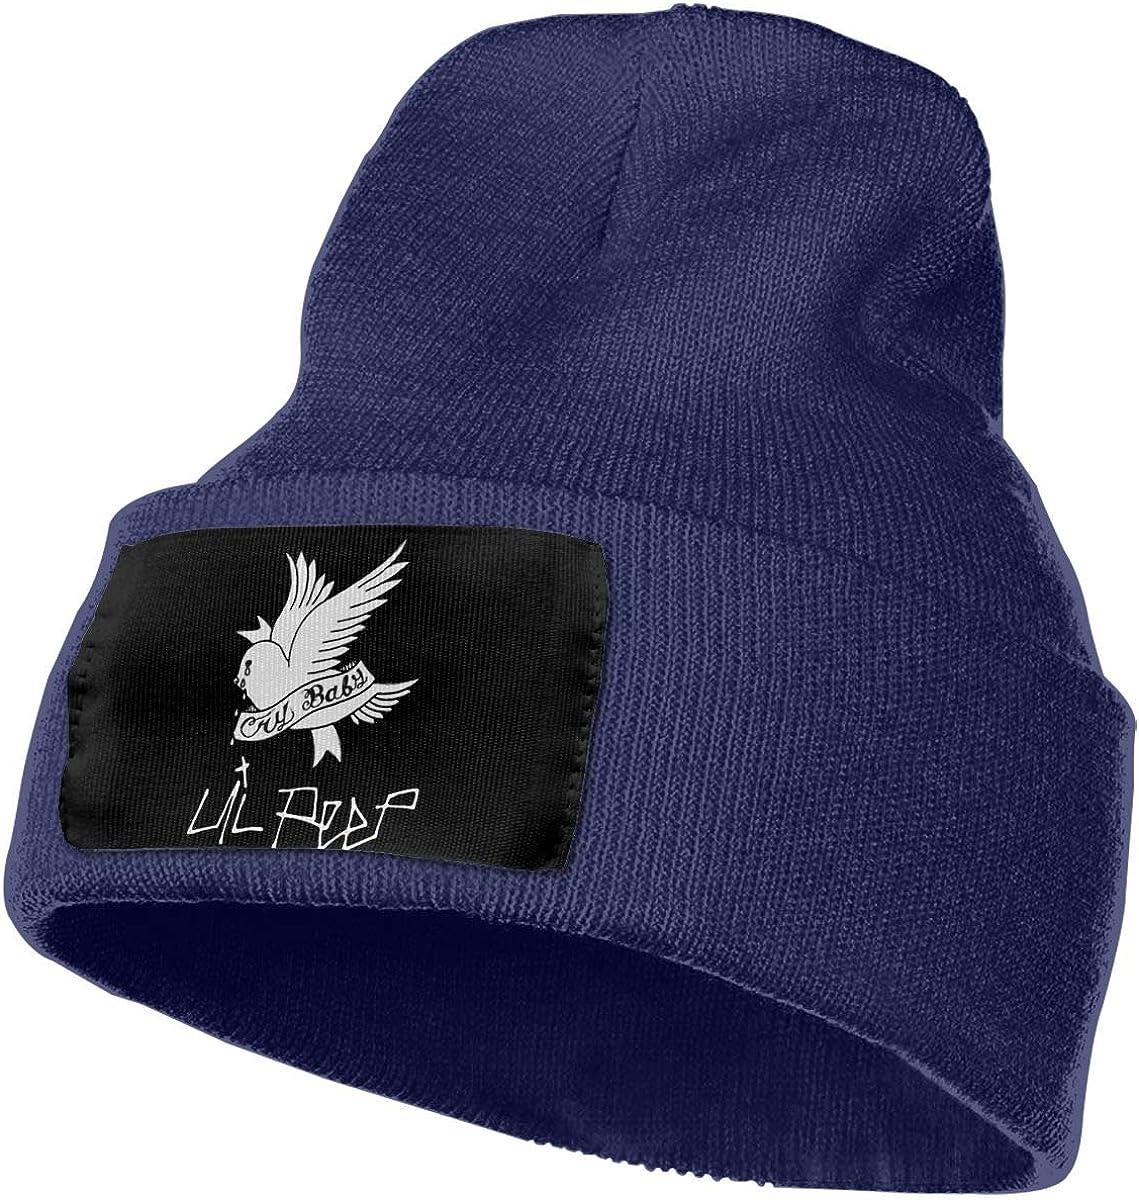 KennedyF Lil Peep Crybaby Skull Hats Cap Cuffed Knit Beanie Hat Black